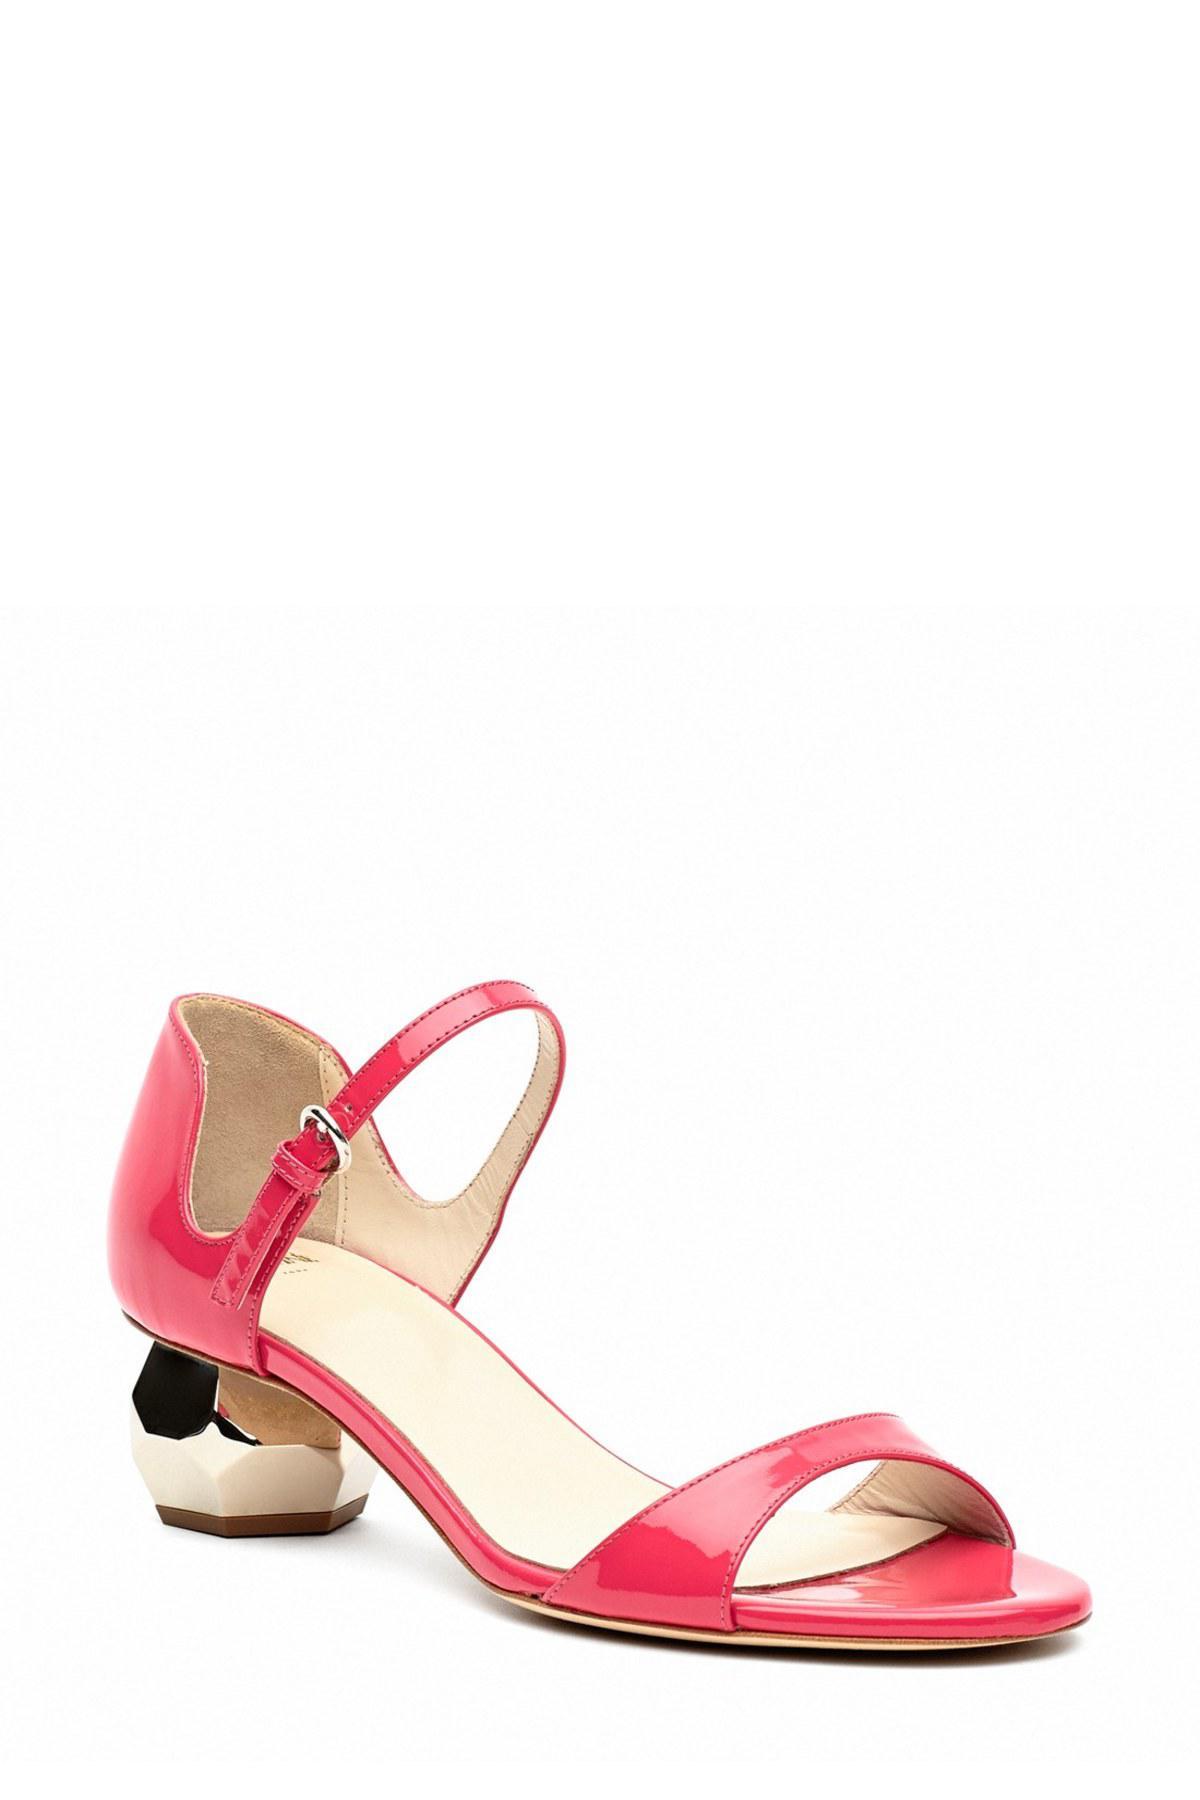 21ce0fd5a124c Lyst - Frances valentine Bella Ankle Strap Sandal in Pink